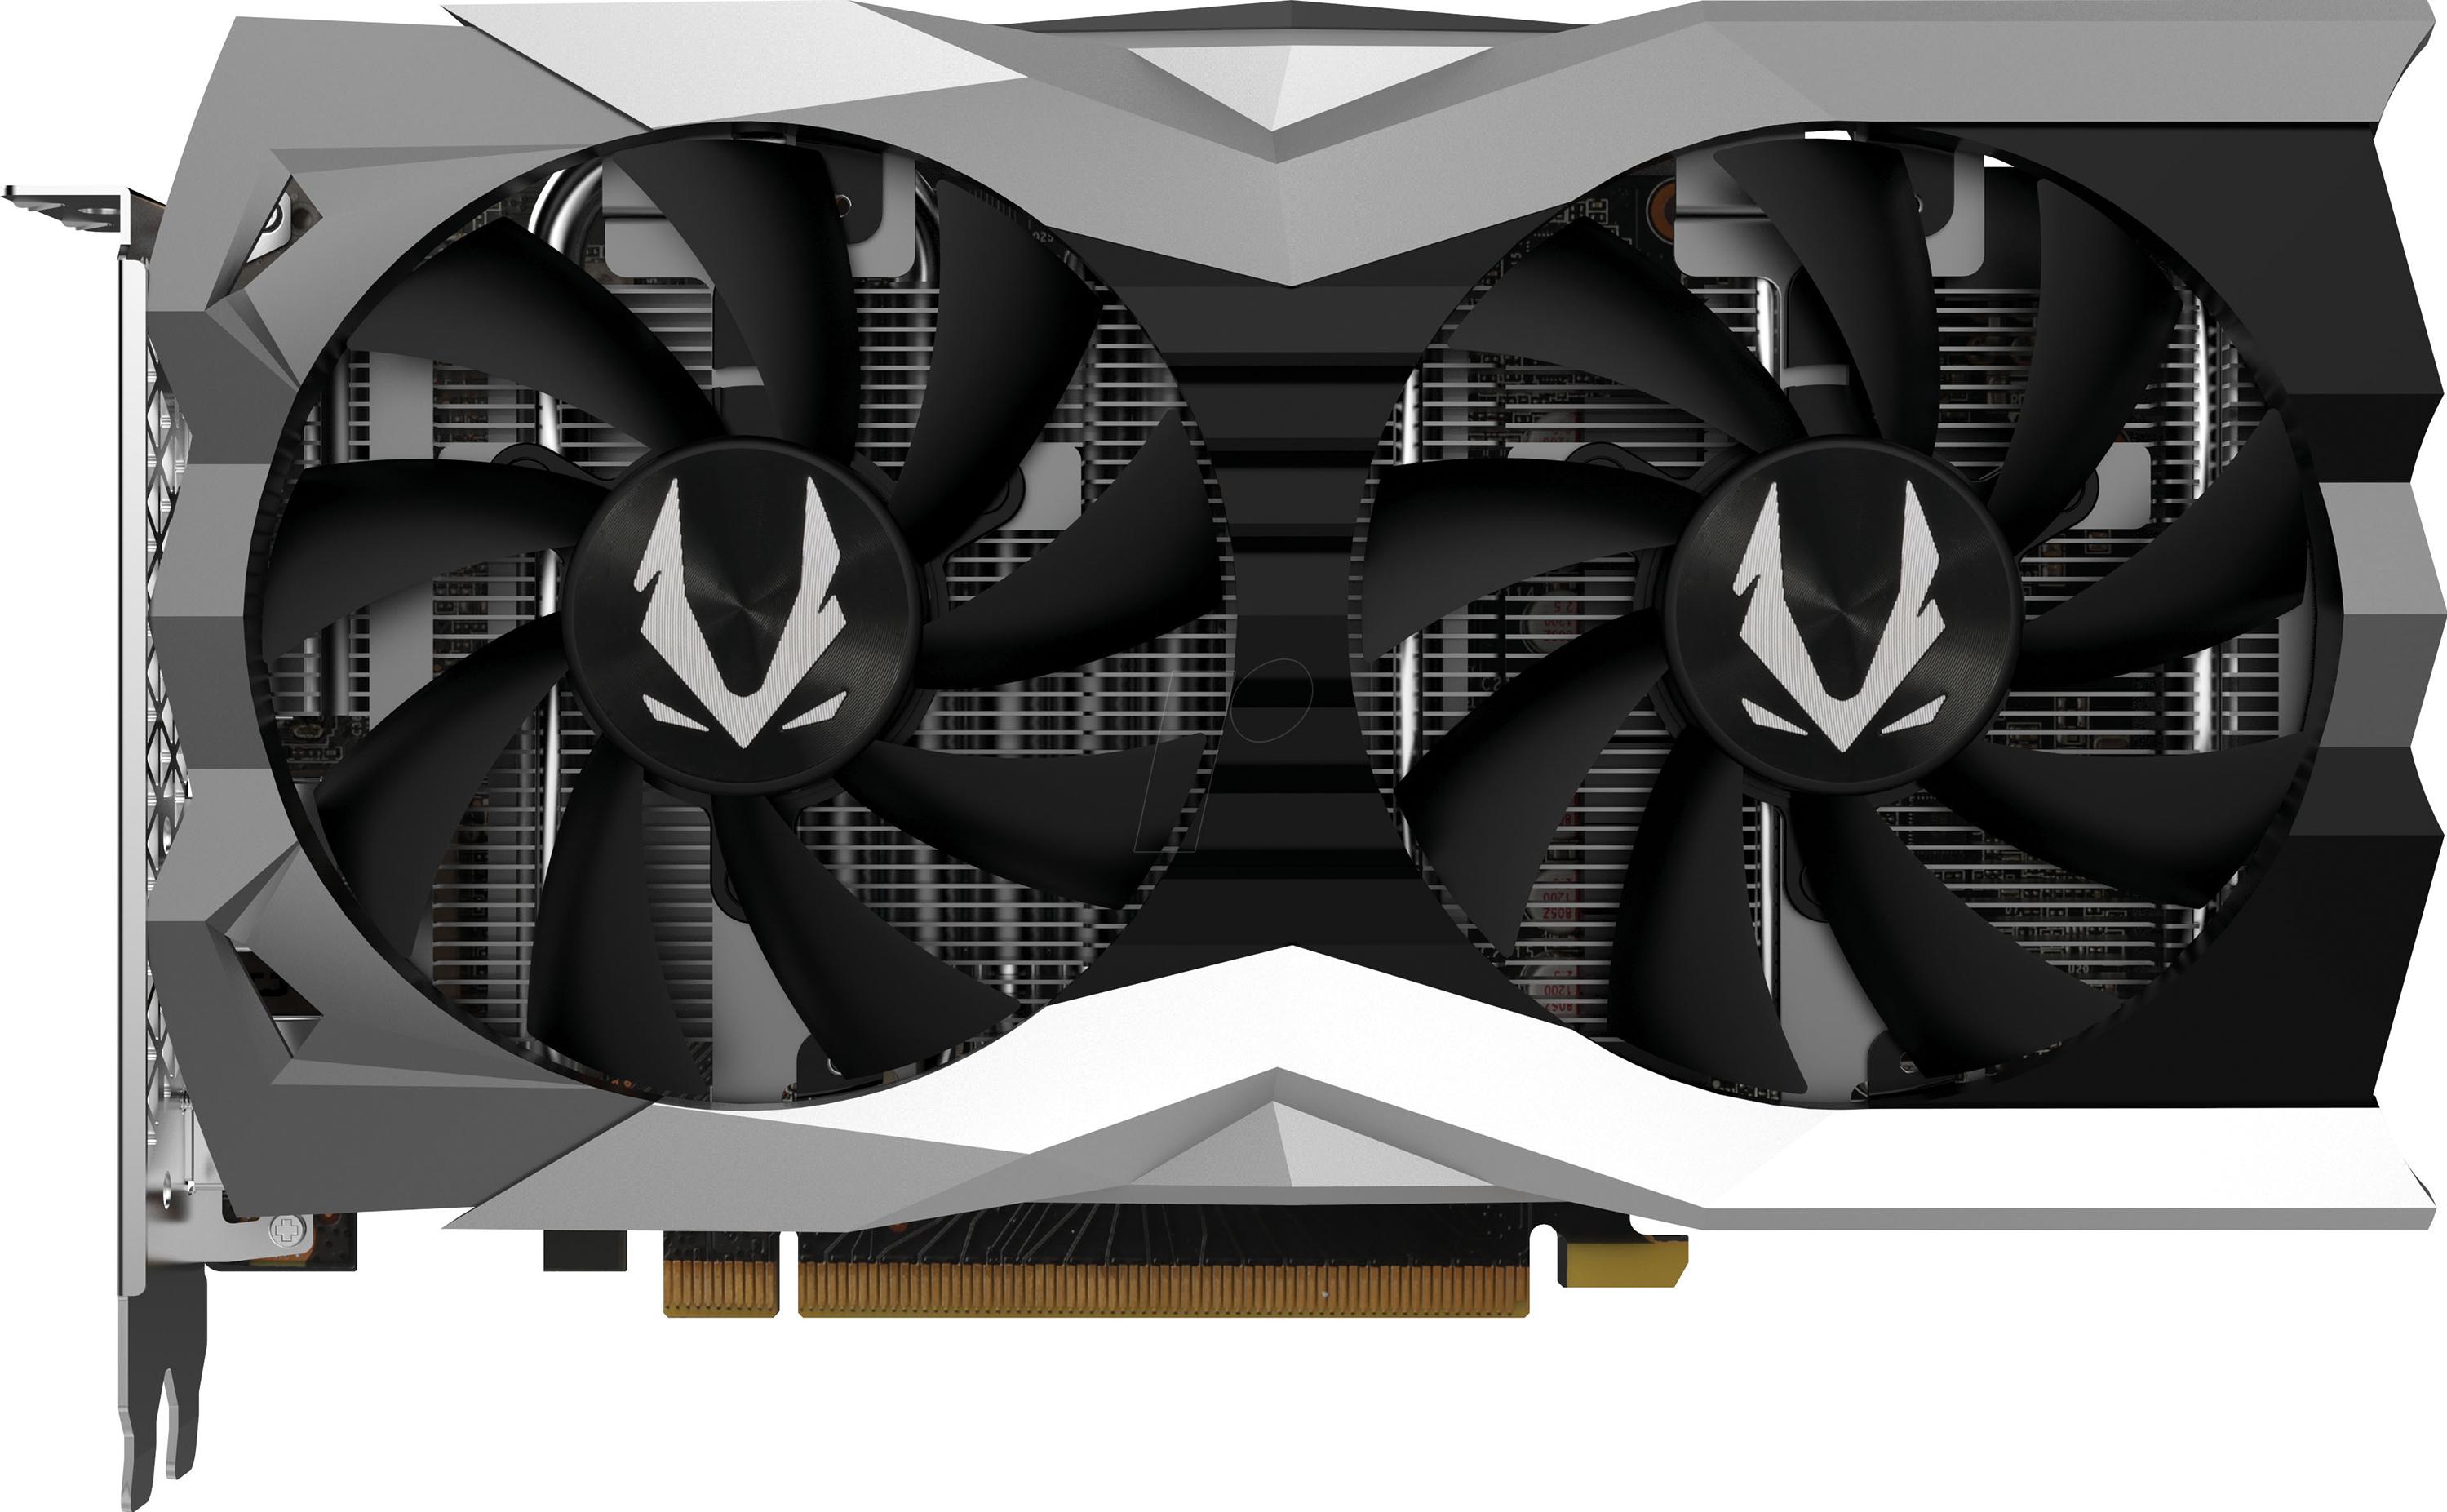 ZT-T20600D-10M ZOTAC GAMING GeForce RTX 2060 AMP 6GB